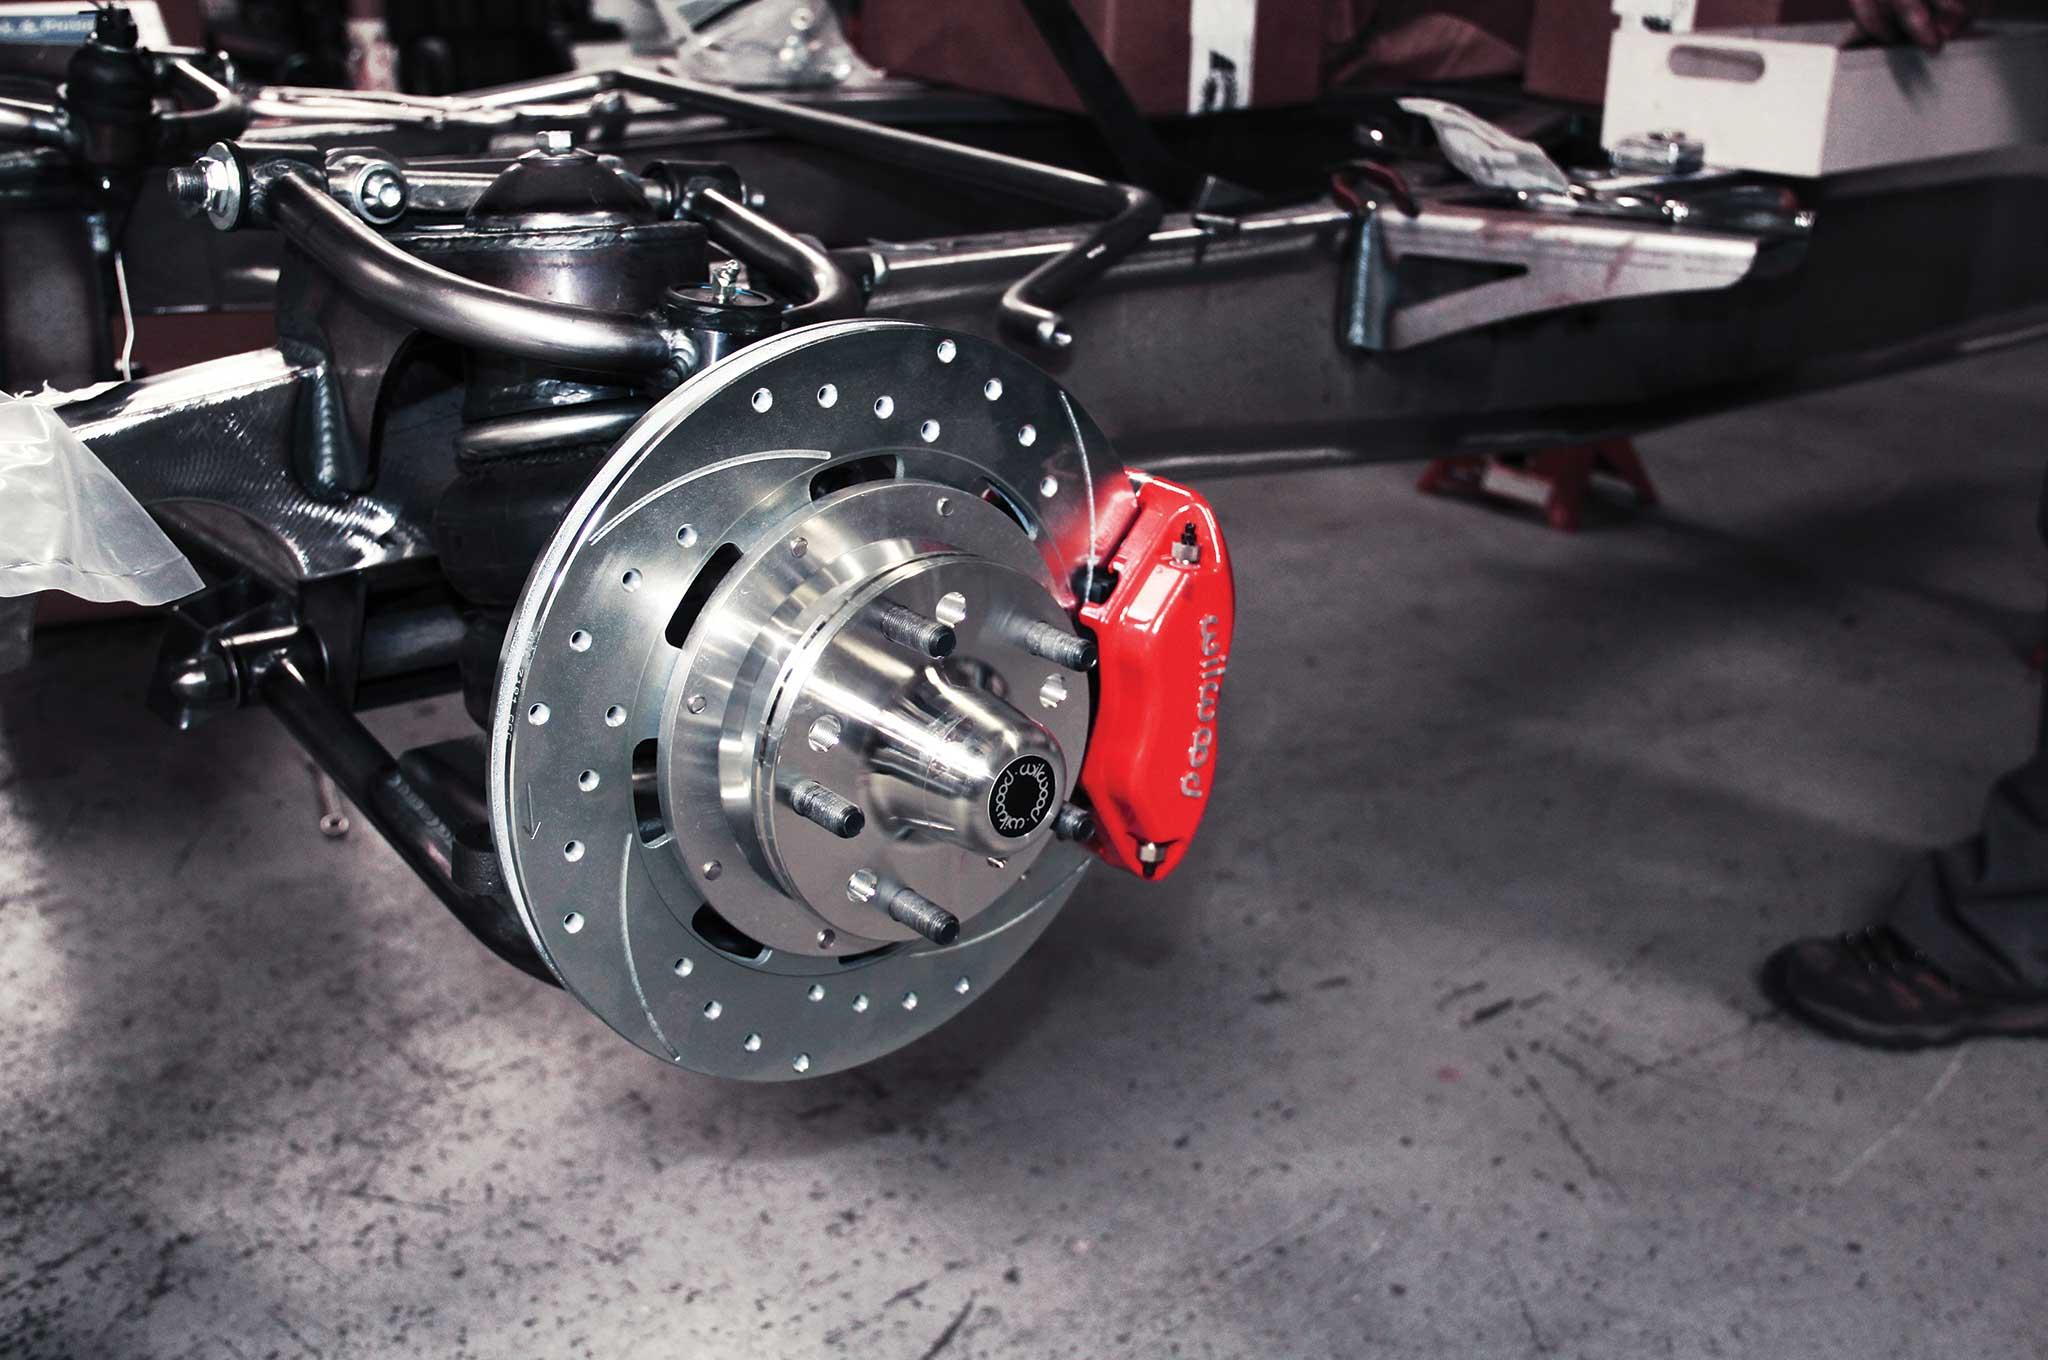 009 assembling a tci truck frame wilwood sic brake system